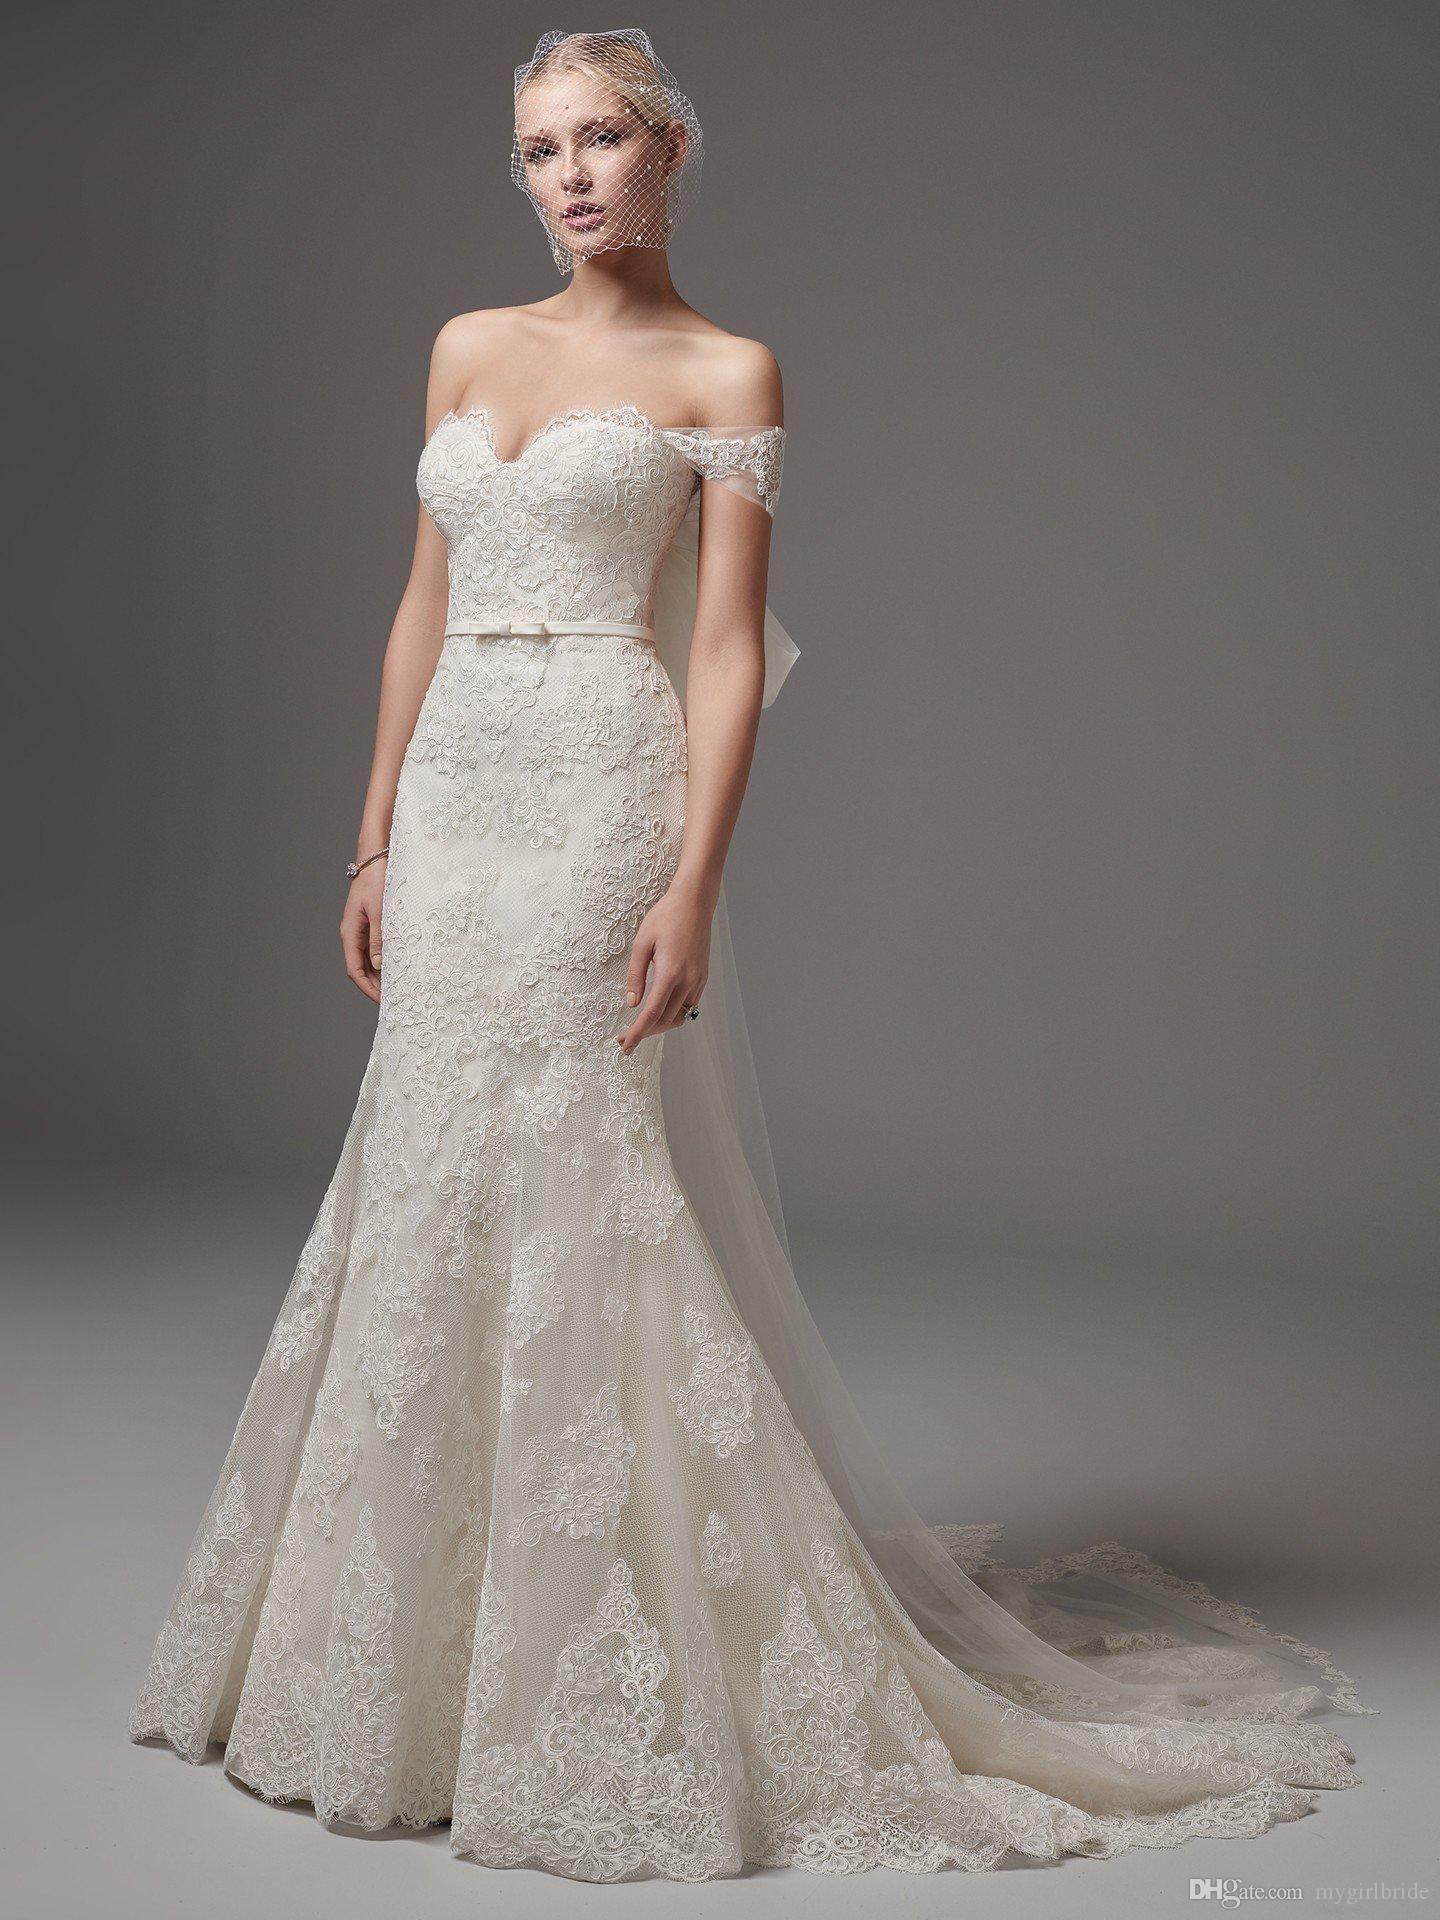 b6726c6493df Sexy Off The Shoulder Mermaid Wedding Dresses Detachable Skirt Lace White  Princess Cap Sleeve Wedding Gown Detachable Train Simple Bridal Gowns  Sleeveless ...